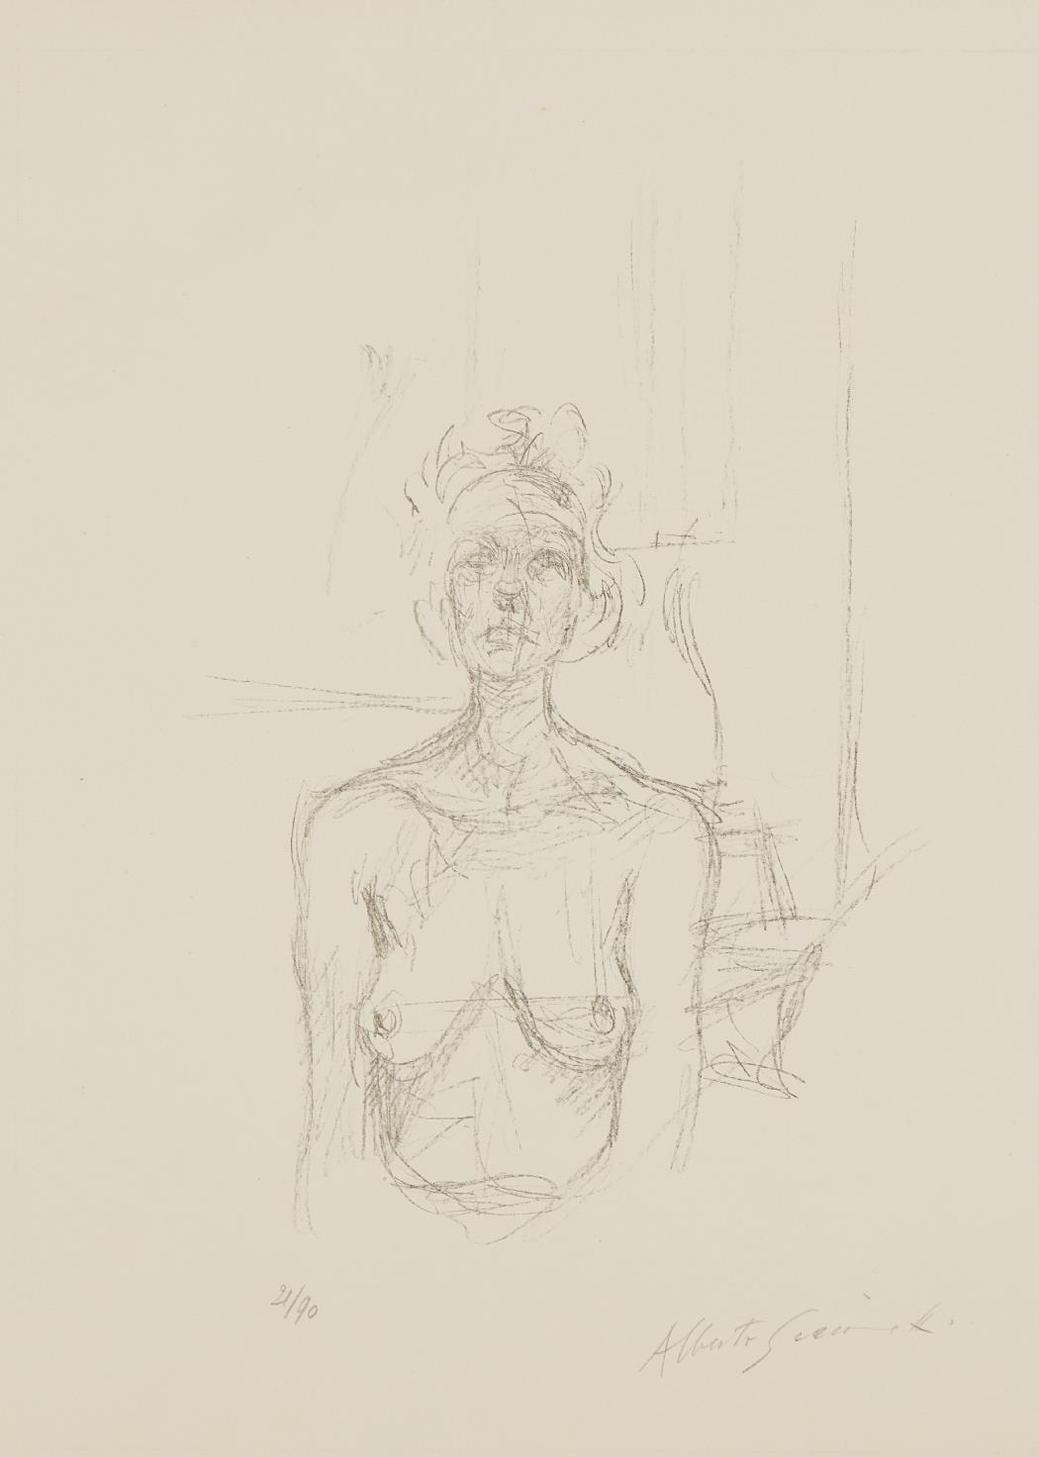 Alberto Giacometti-Buste I (Bust I)-1960